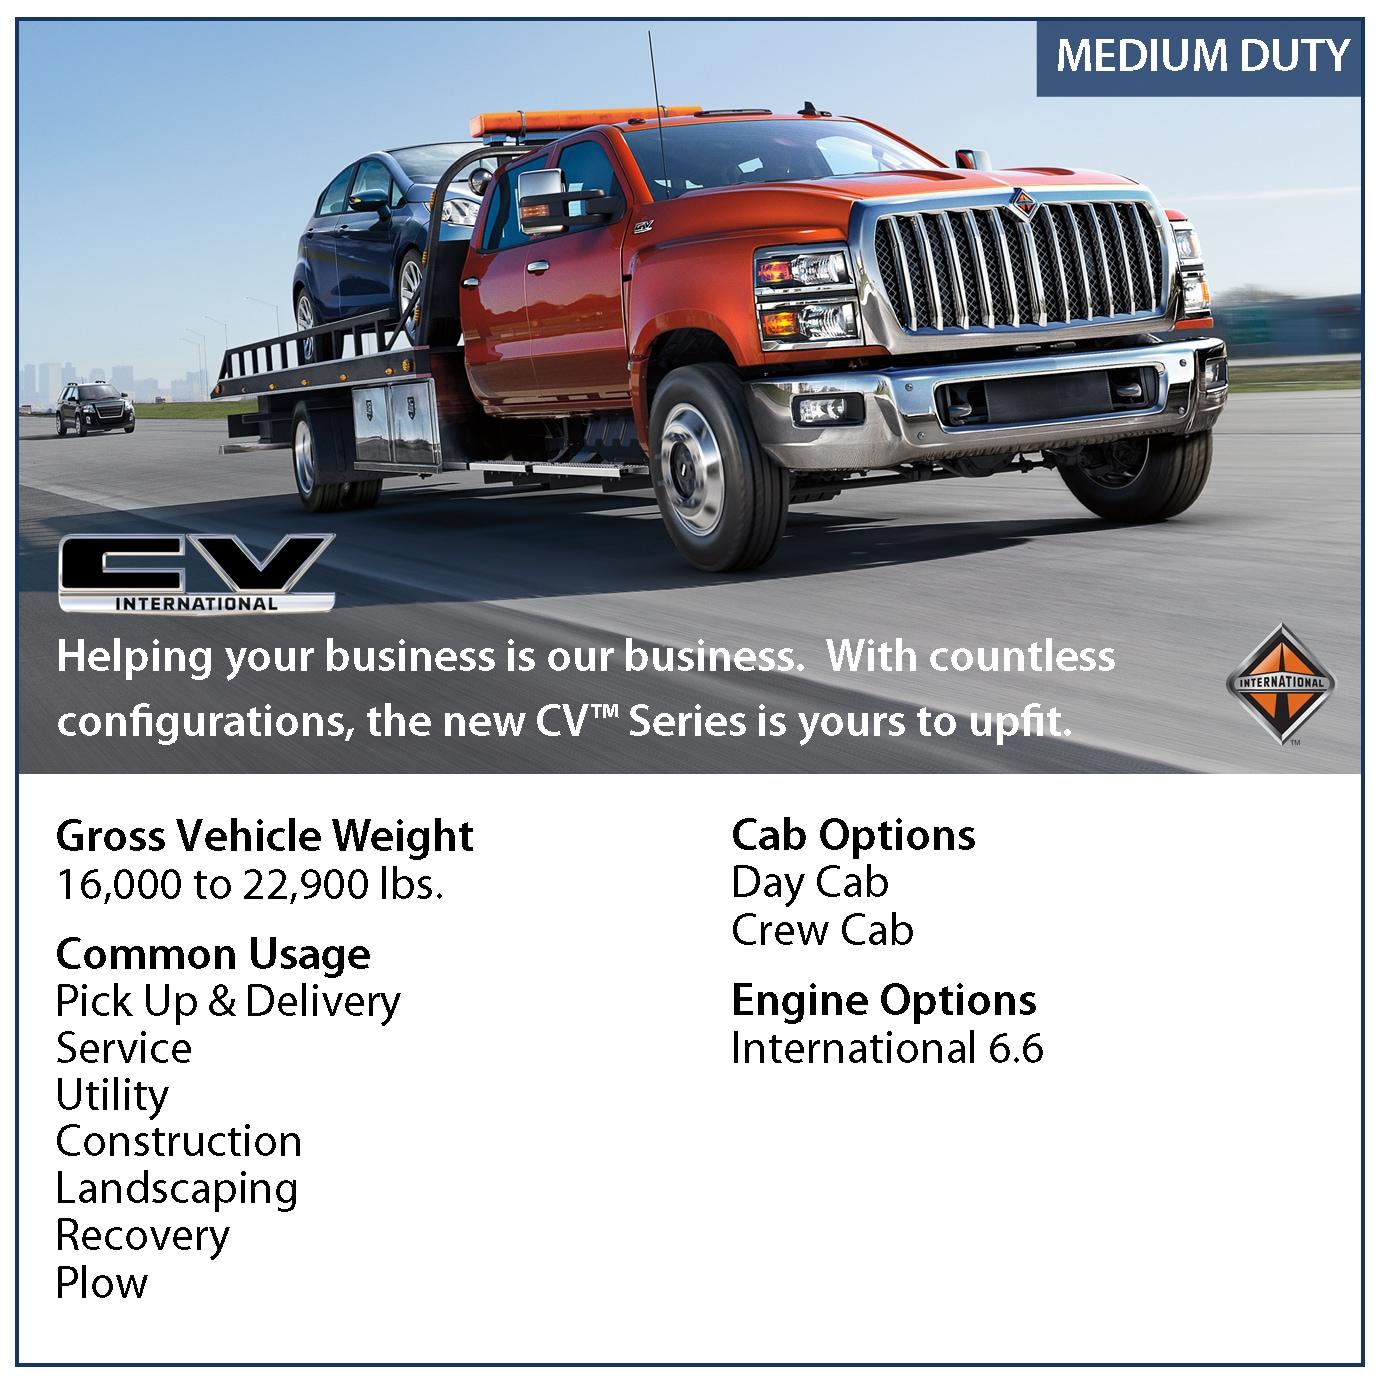 IRL International & IRL Isuzu Trucks | View Our Line Up